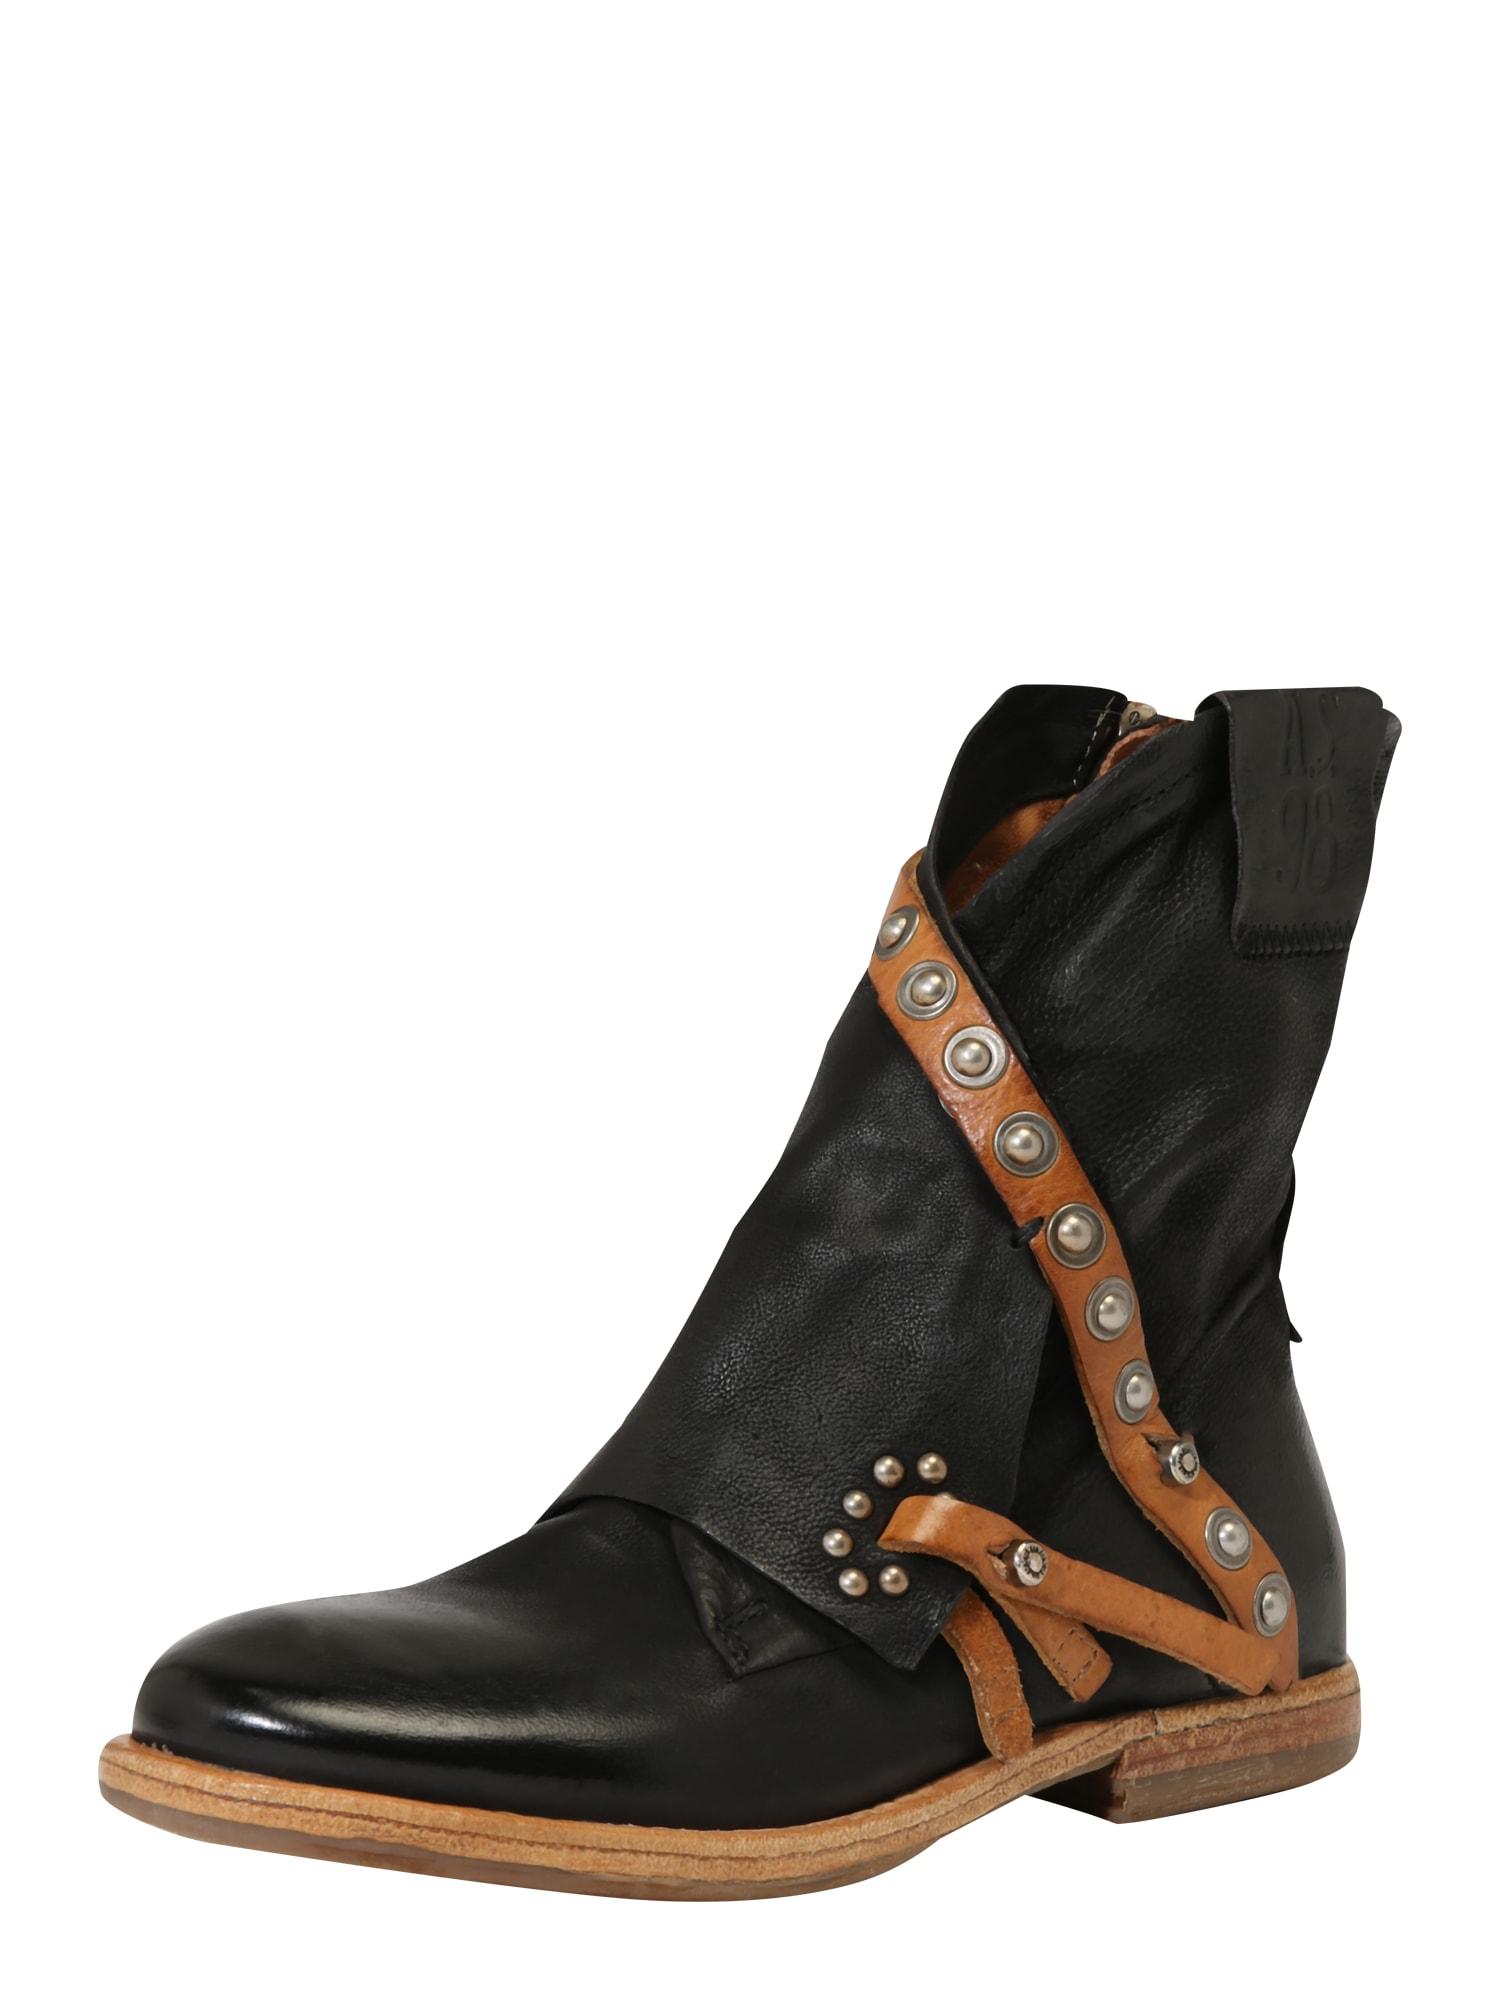 A.S.98 Auliniai batai 'ZEPORT' juoda / ruda